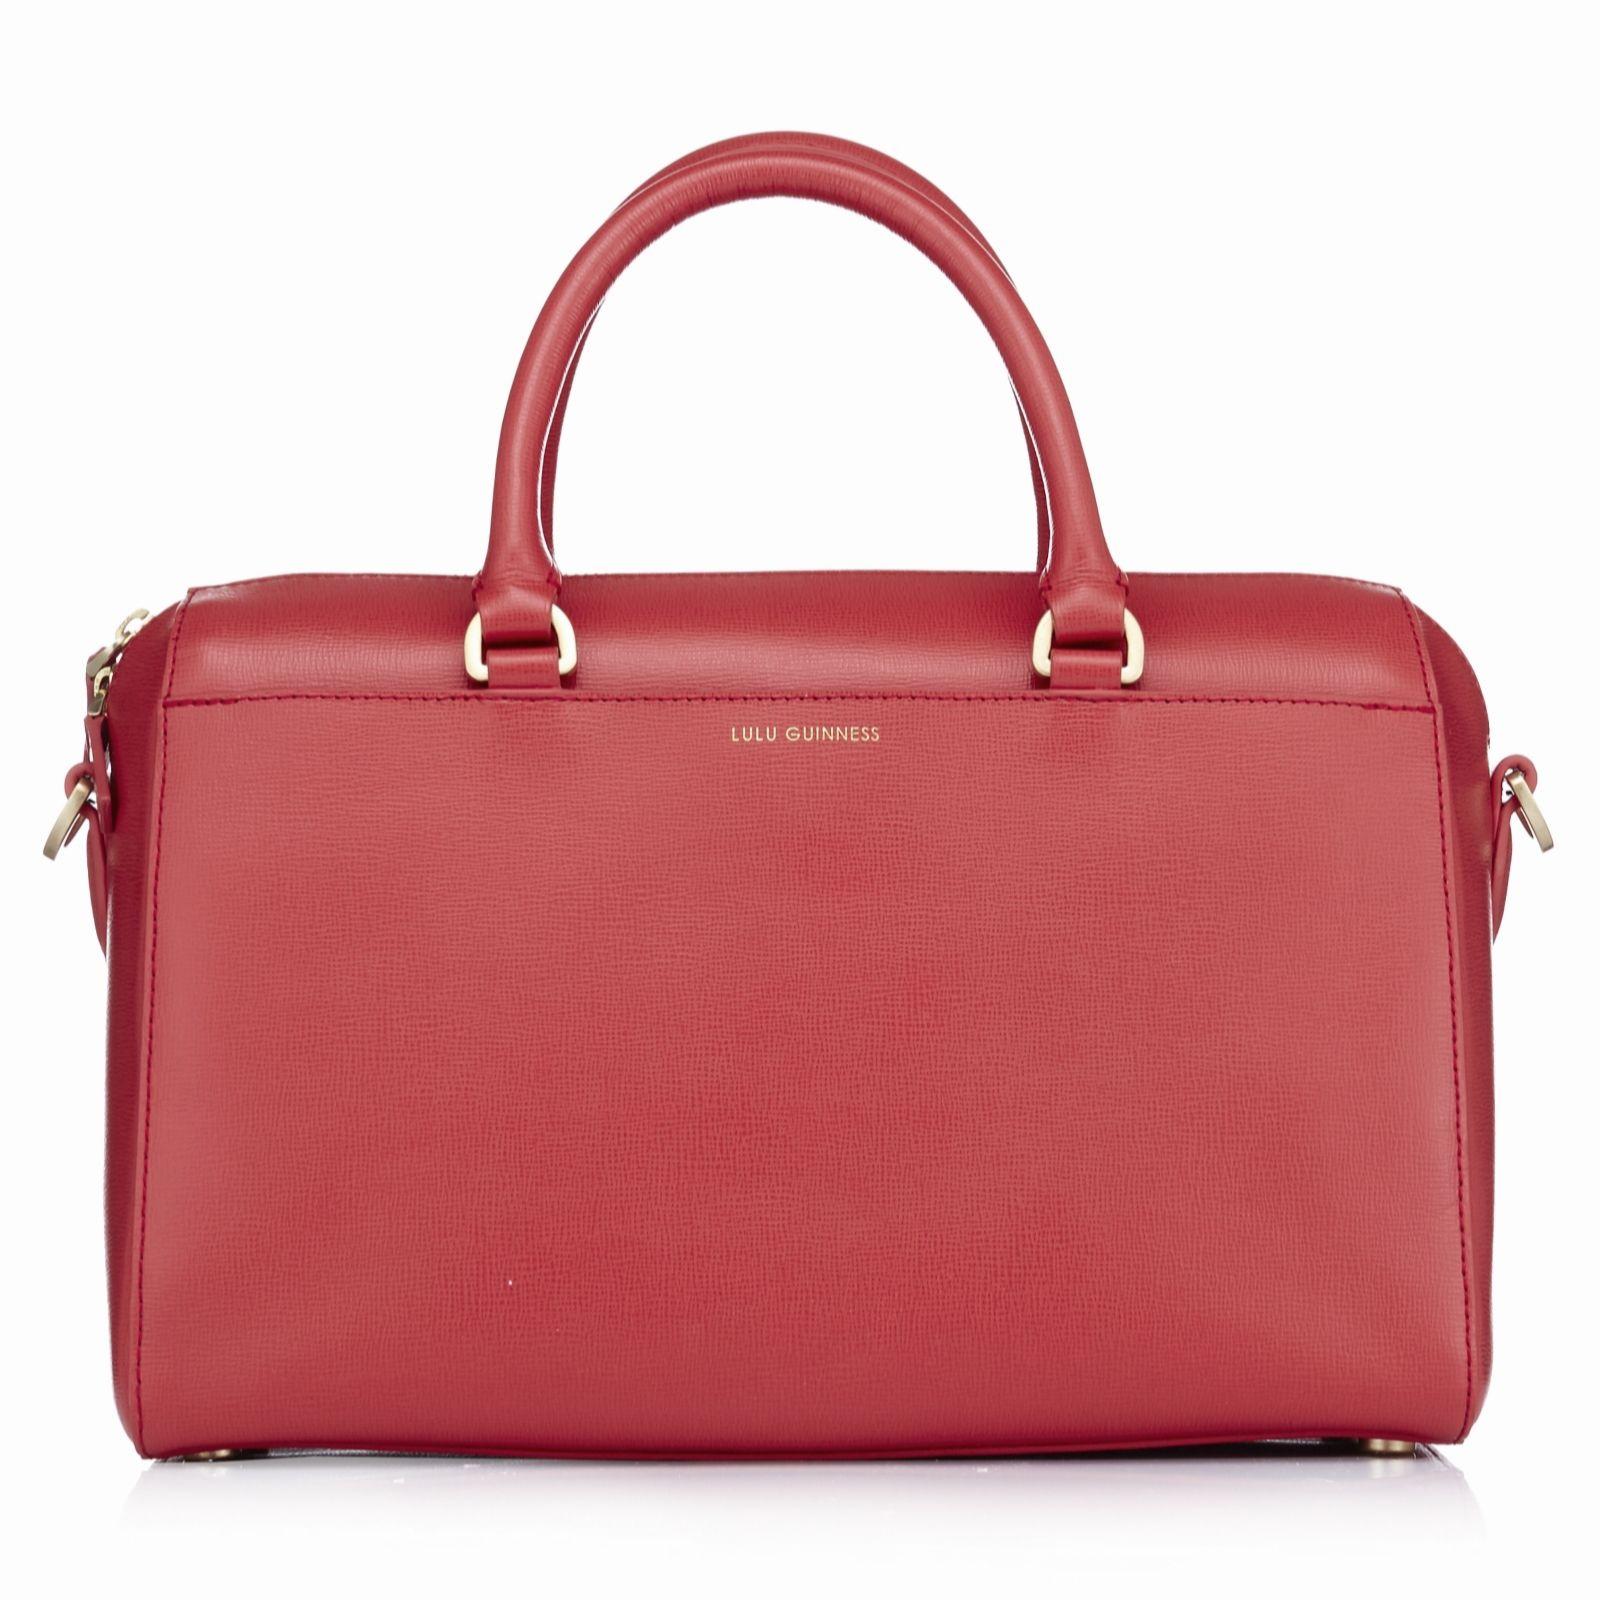 Lulu Guinness Arabella Large Leather Bowling Bag With Crossbody Strap Qvc Uk